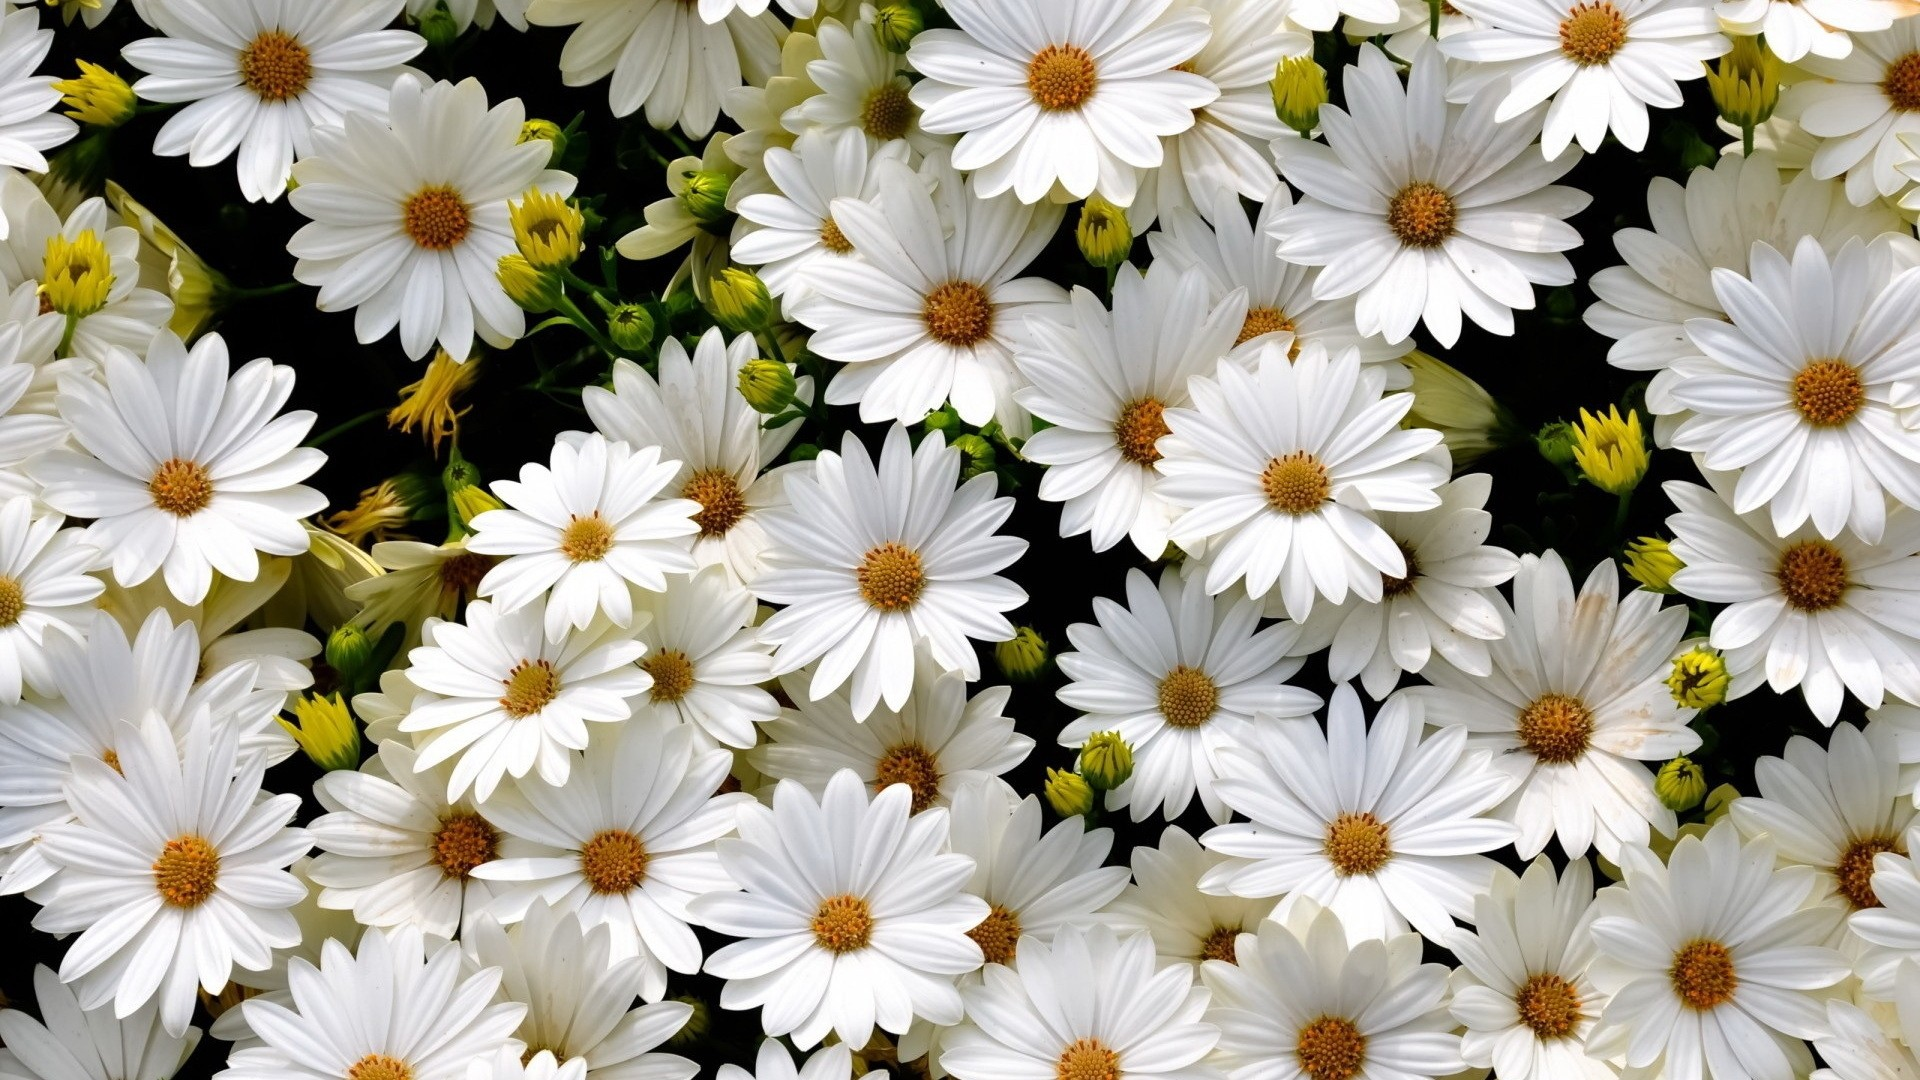 Daisy HD Download